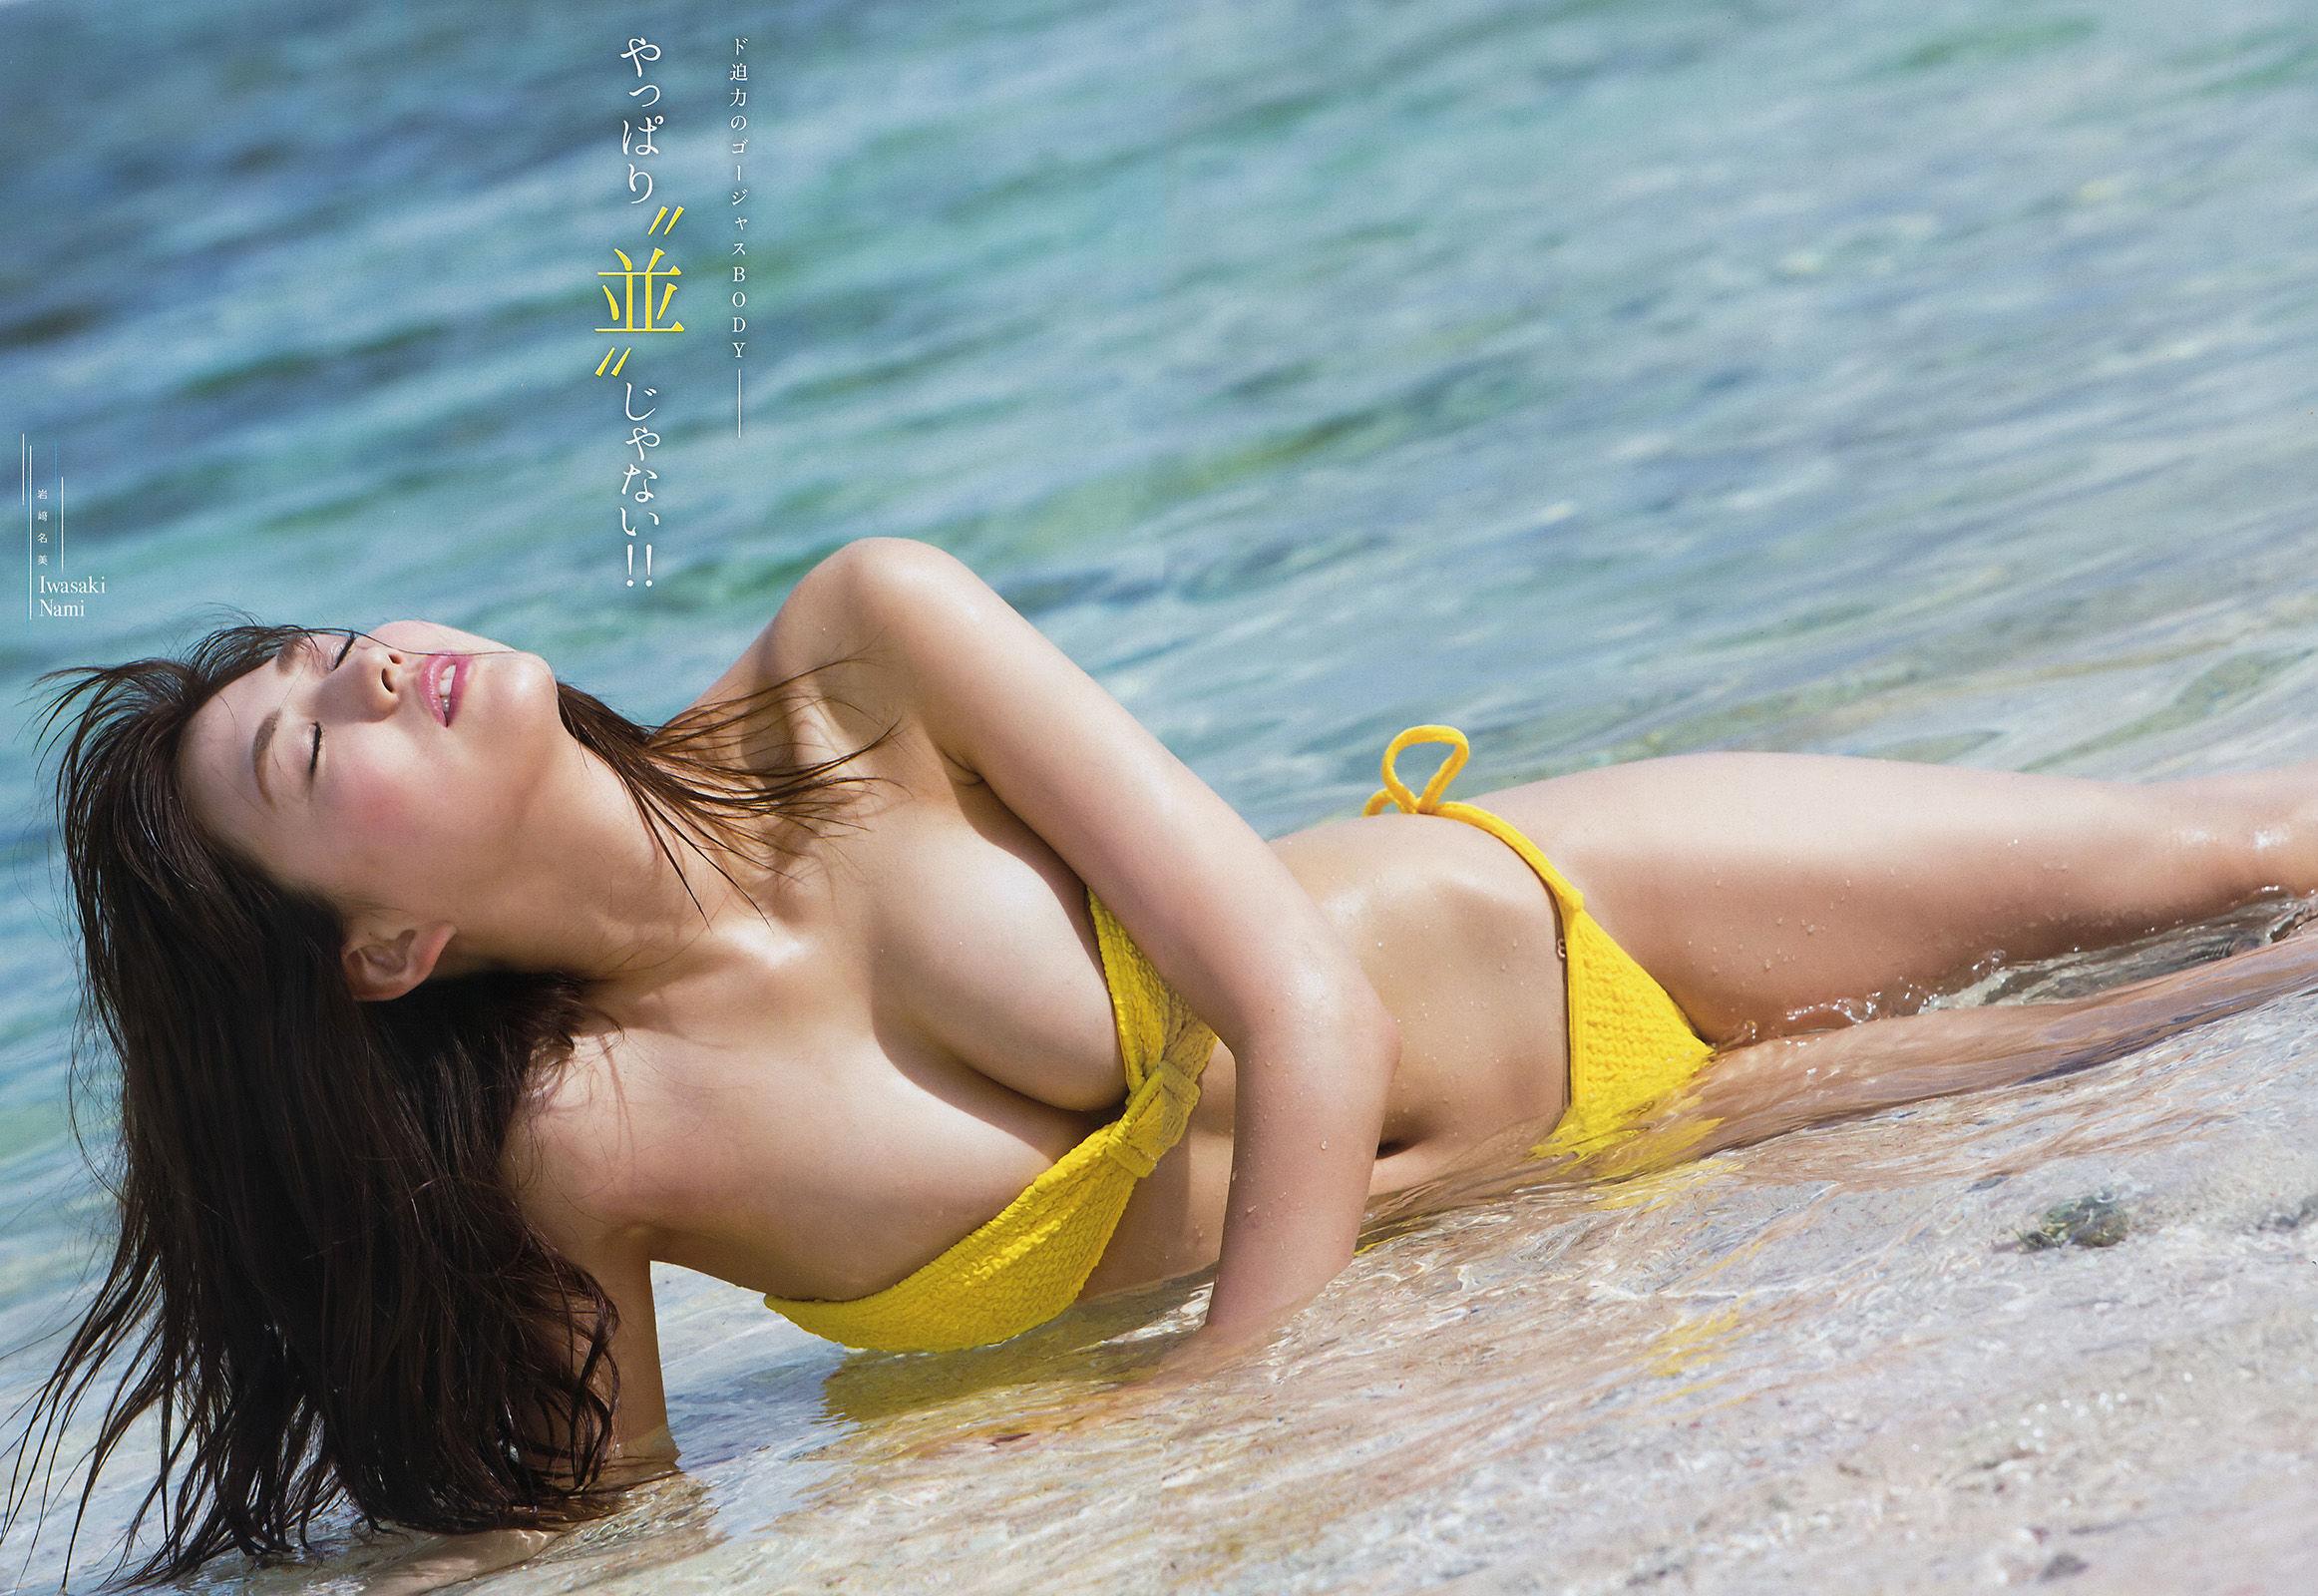 VOL.732 [Young Magazine]日本嫩模:岩﨑名美超高清写真套图(11P)